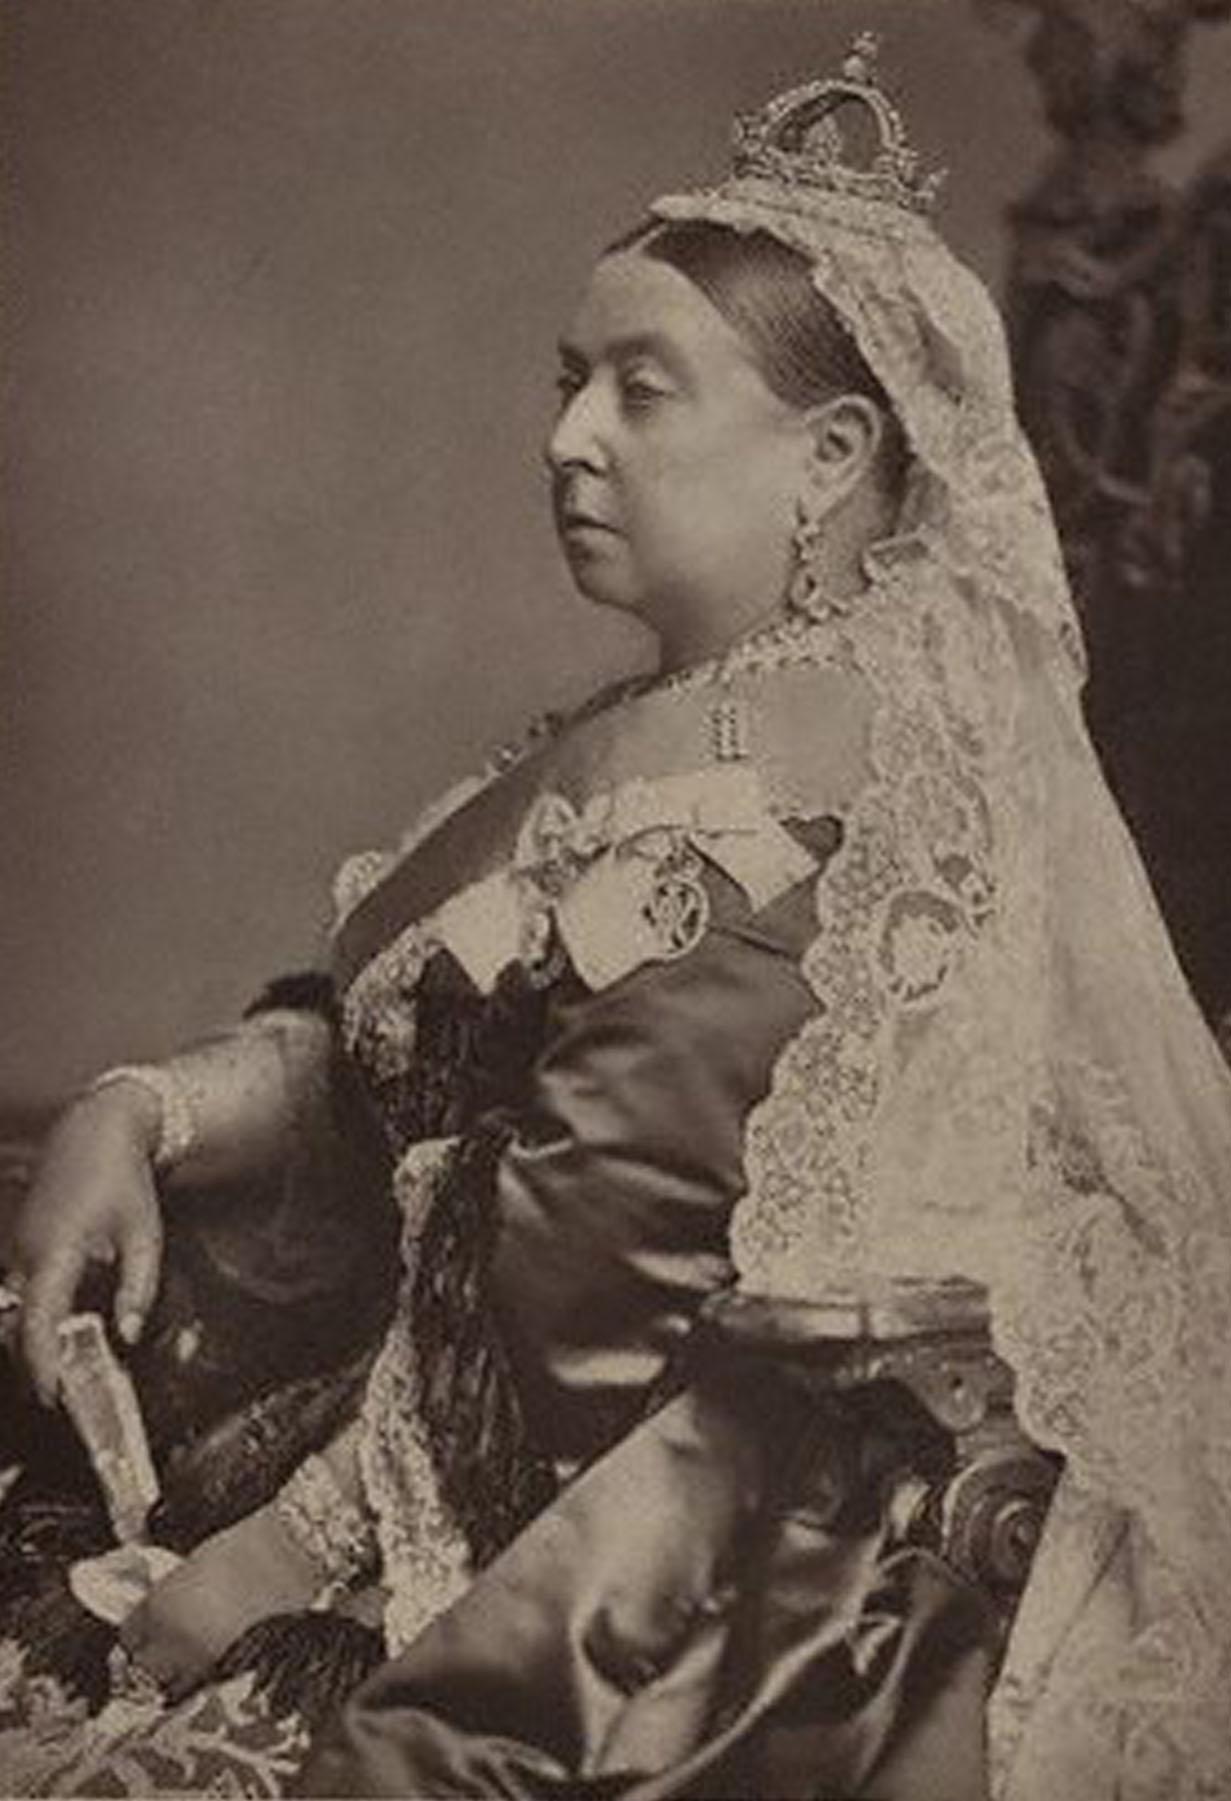 "Imagini pentru Regina Victoria a Marii Britanii photos"""